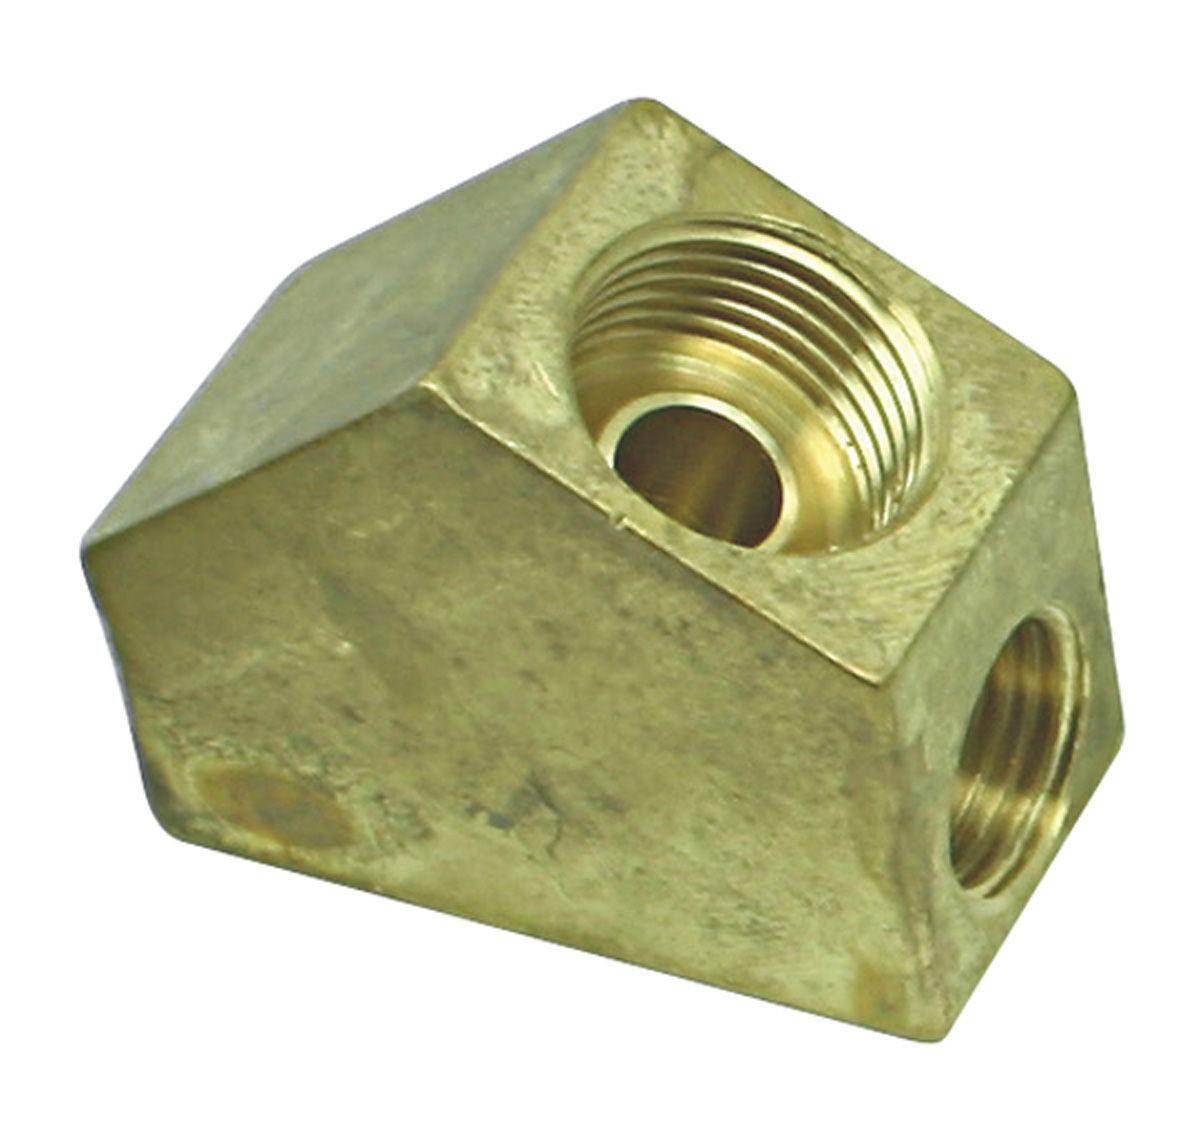 Photo of Fuel Pump-To-Carburetor Line Bracket & Brace all Holley carbs, Y-block